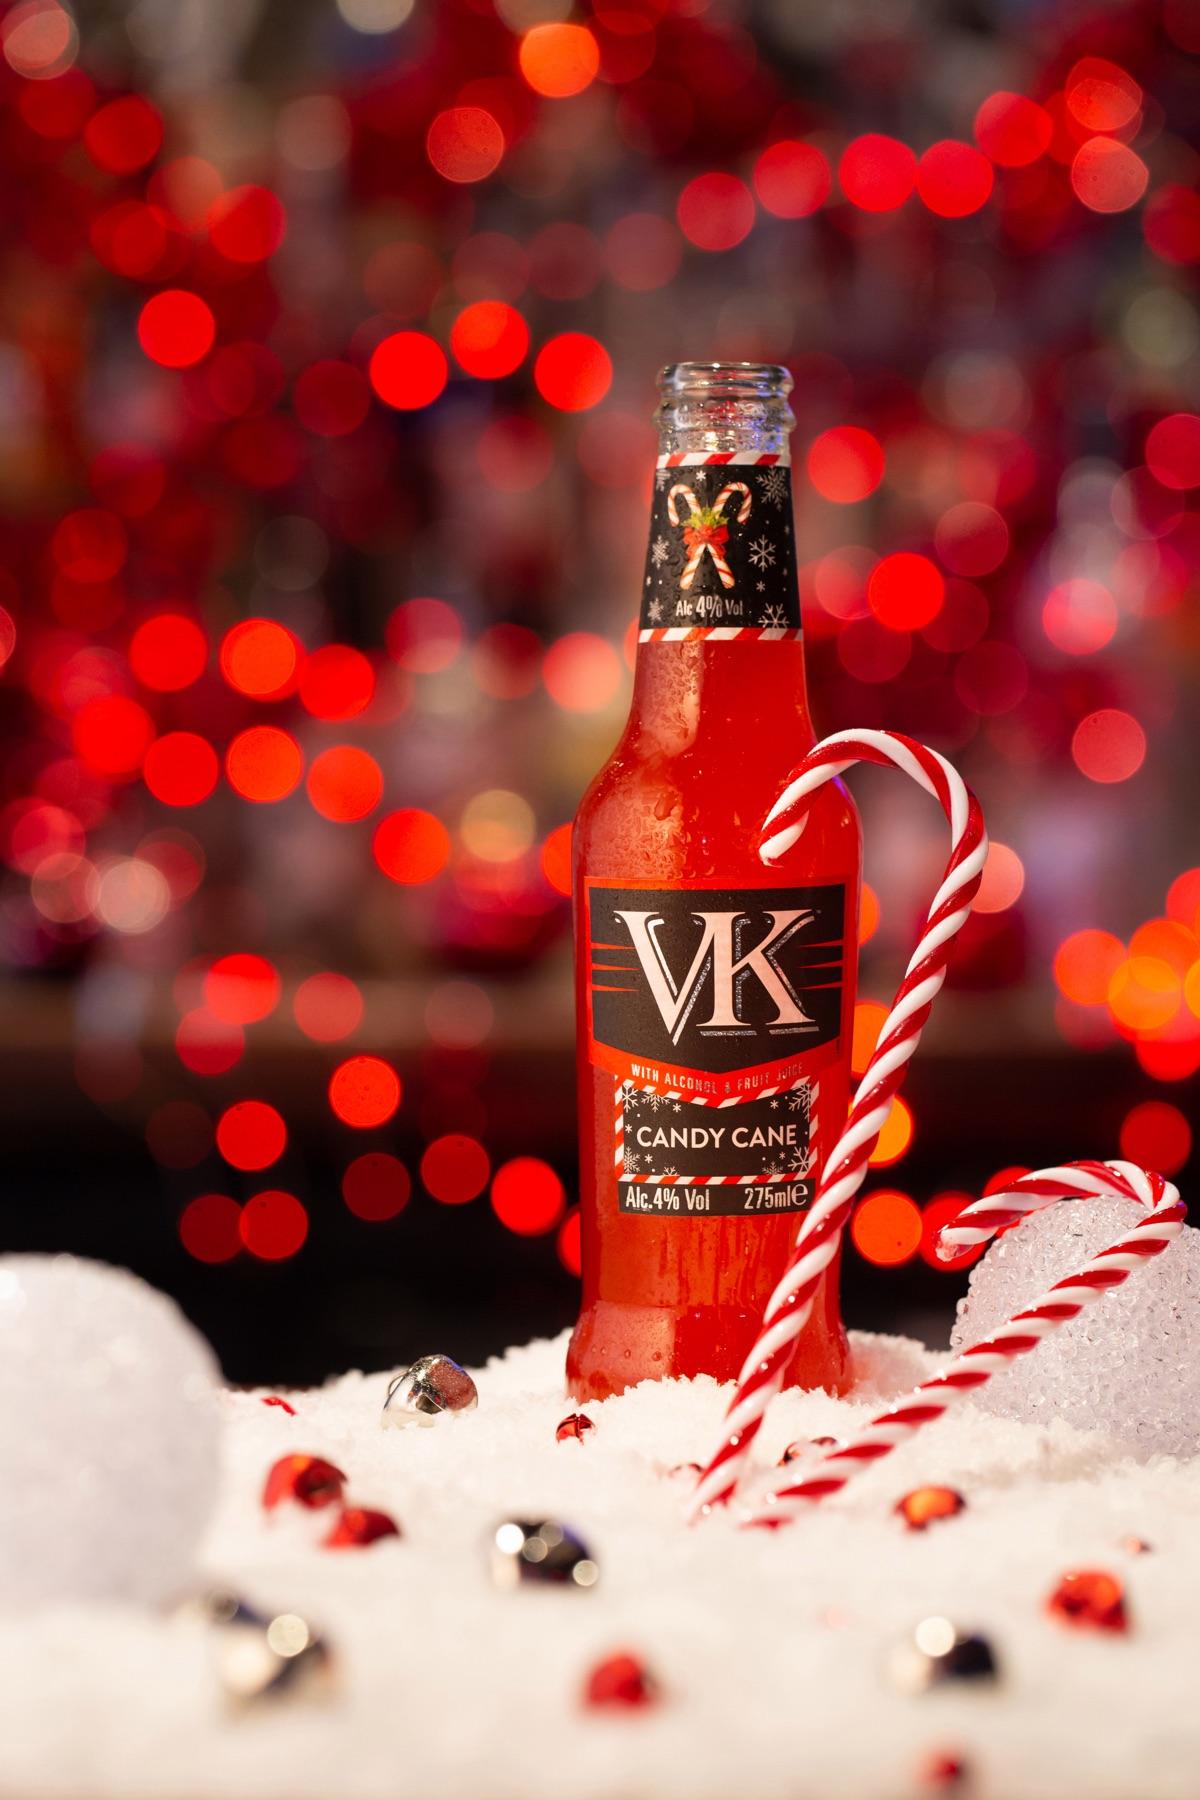 VK-Candy-Cane